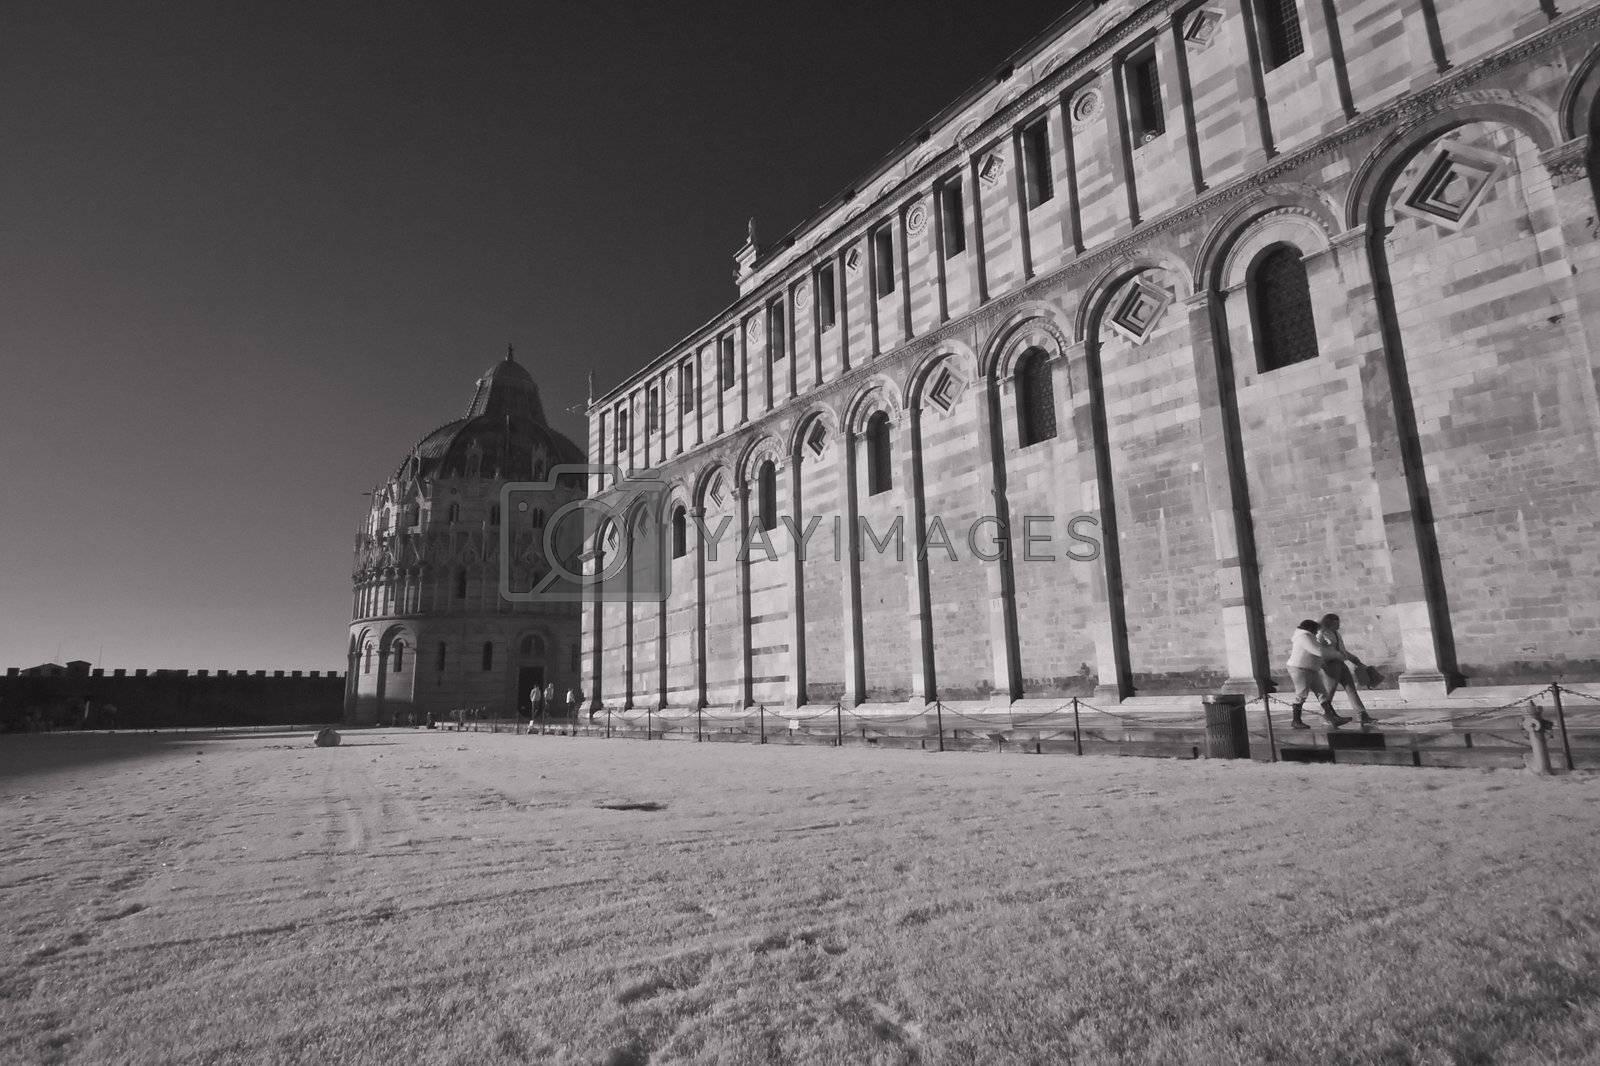 Piazza dei Miracoli, Pisa, Tuscany, December 2009 by jovannig